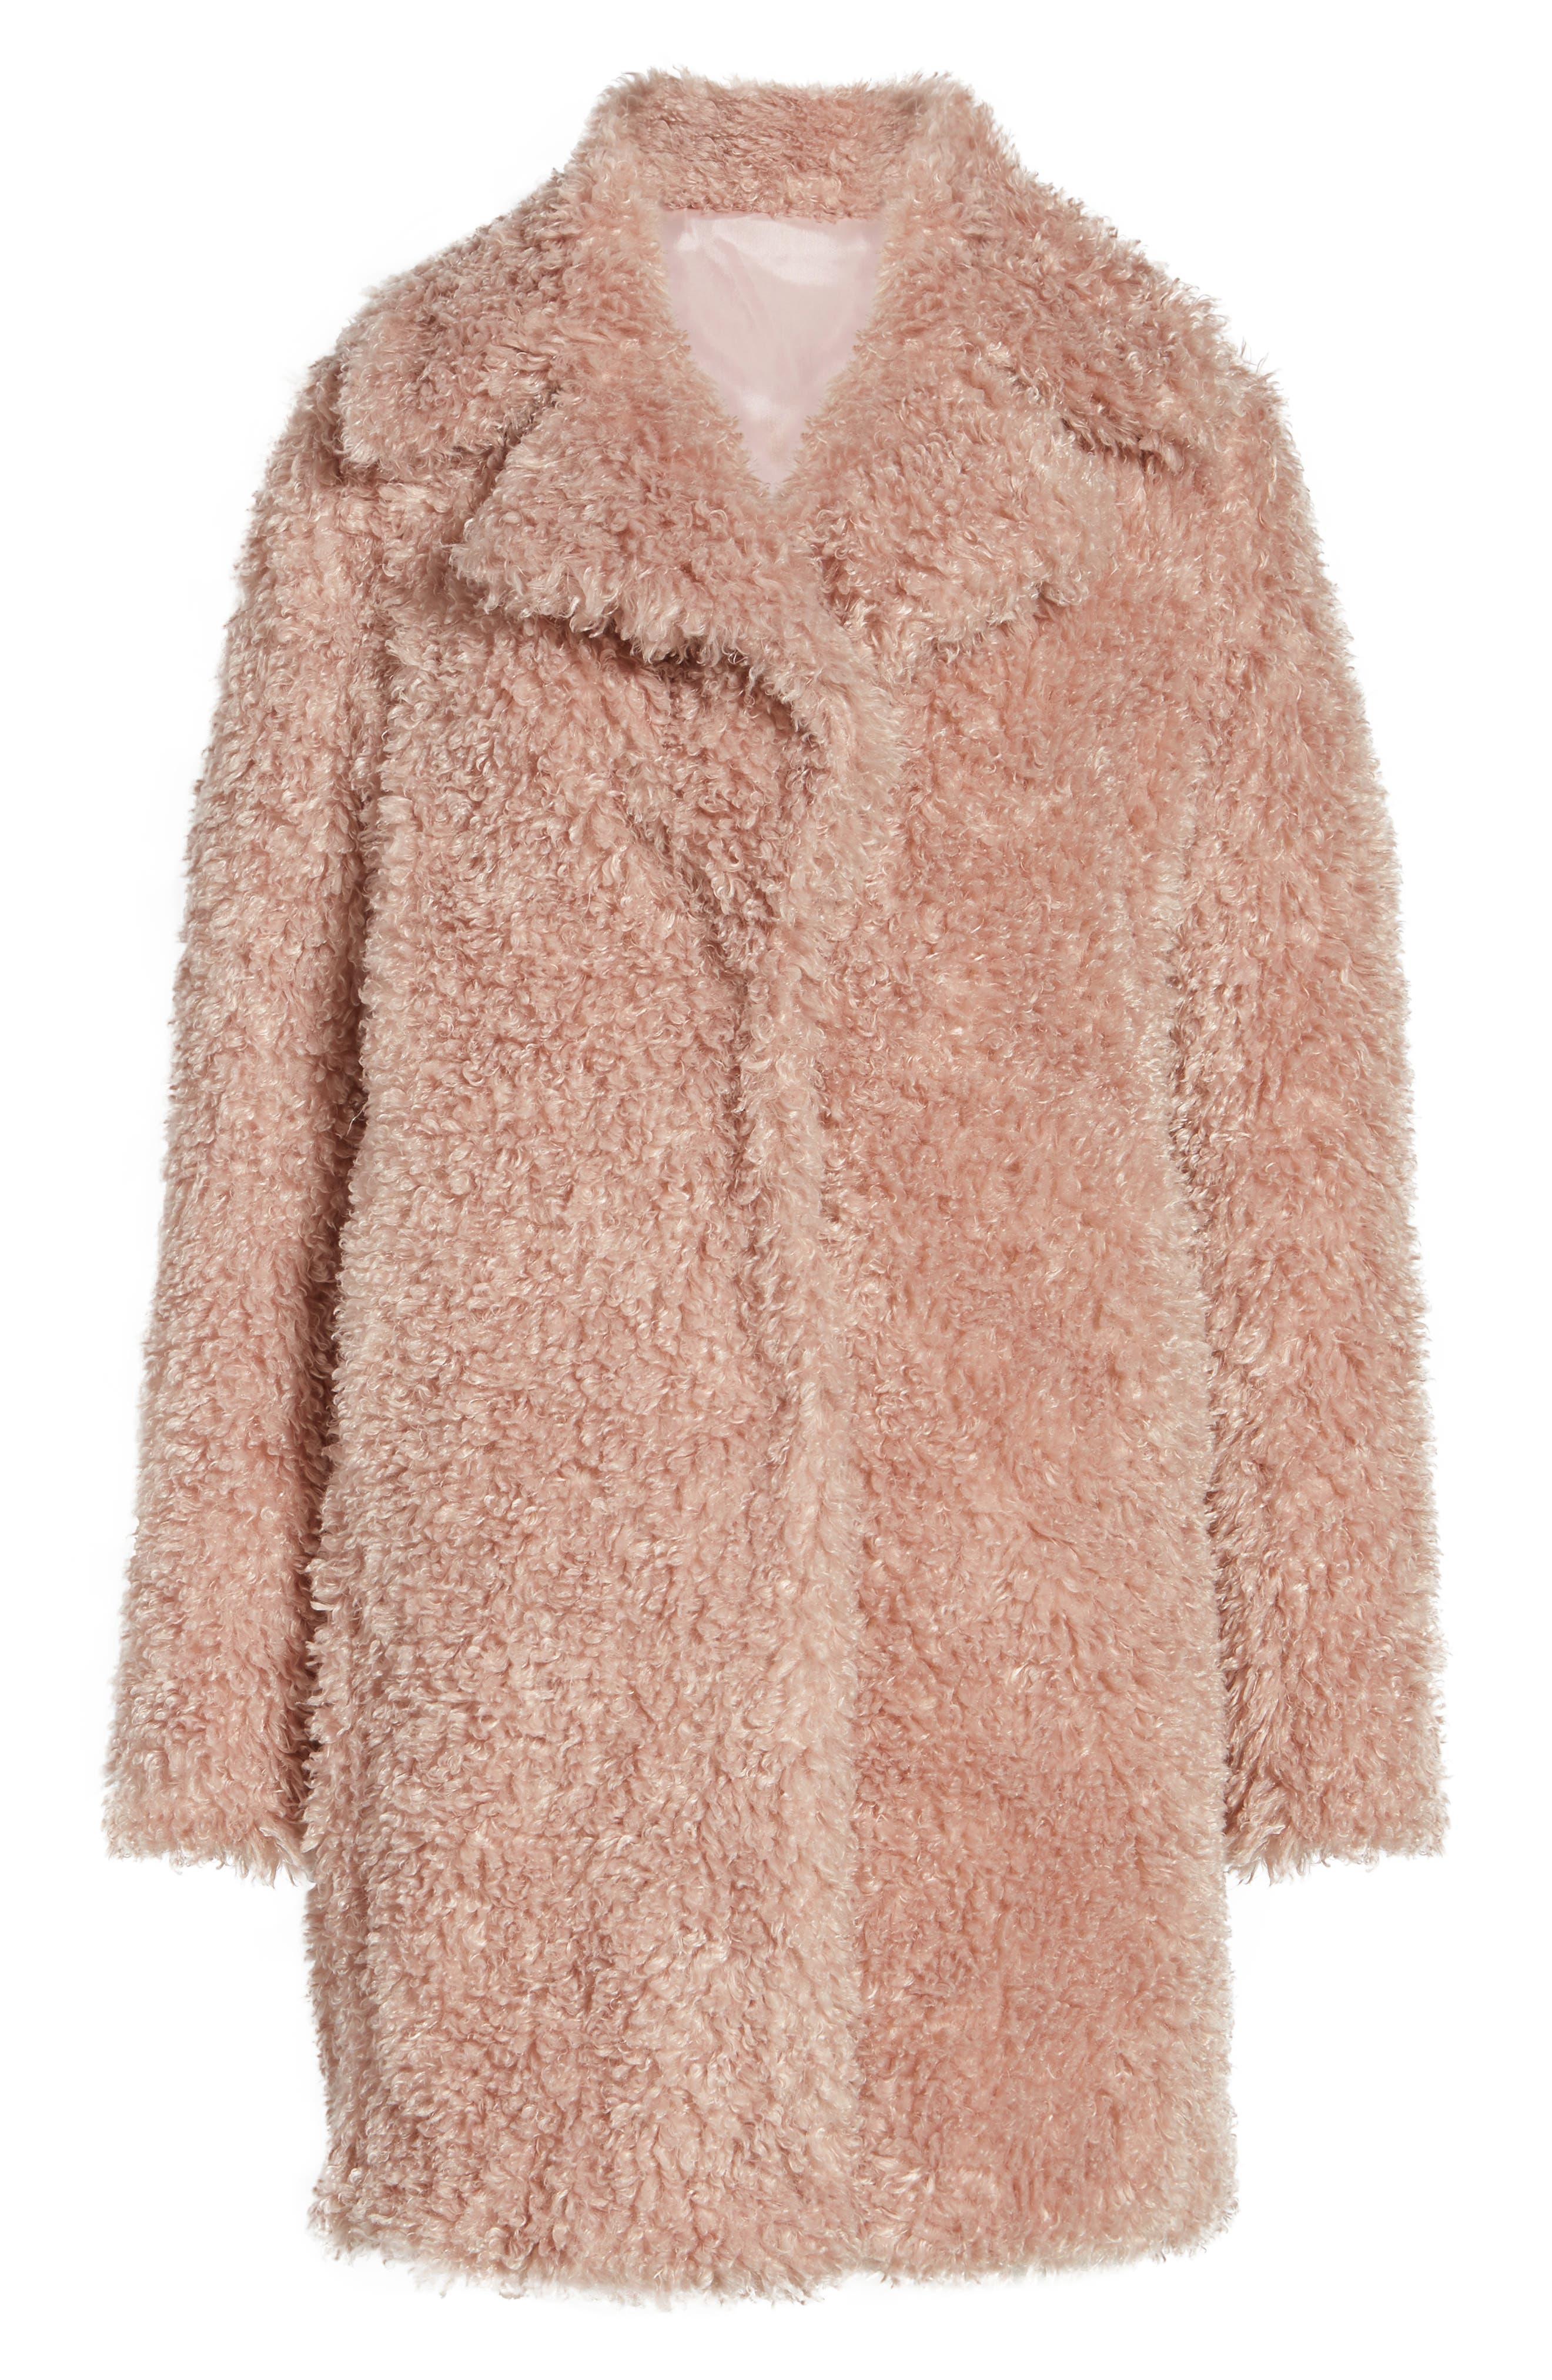 'Teddy Bear' Notch Collar Reversible Faux Fur Coat,                             Alternate thumbnail 23, color,